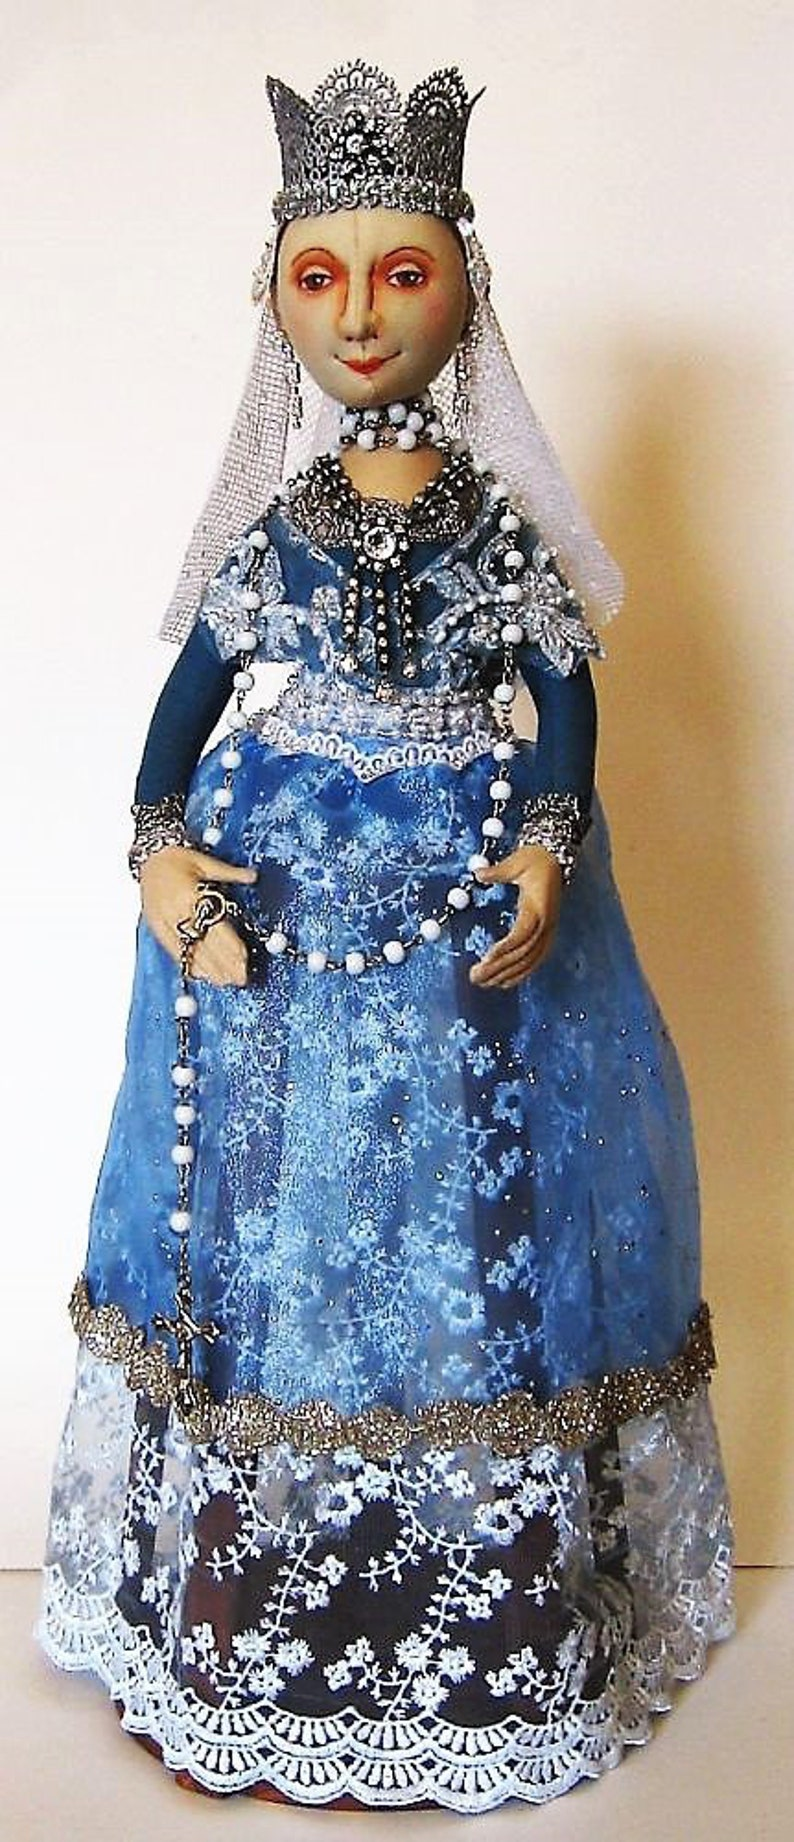 Cloth Doll Artist ISABELLA SANTOS /& Cage E-Pattern By Arley Berryhill